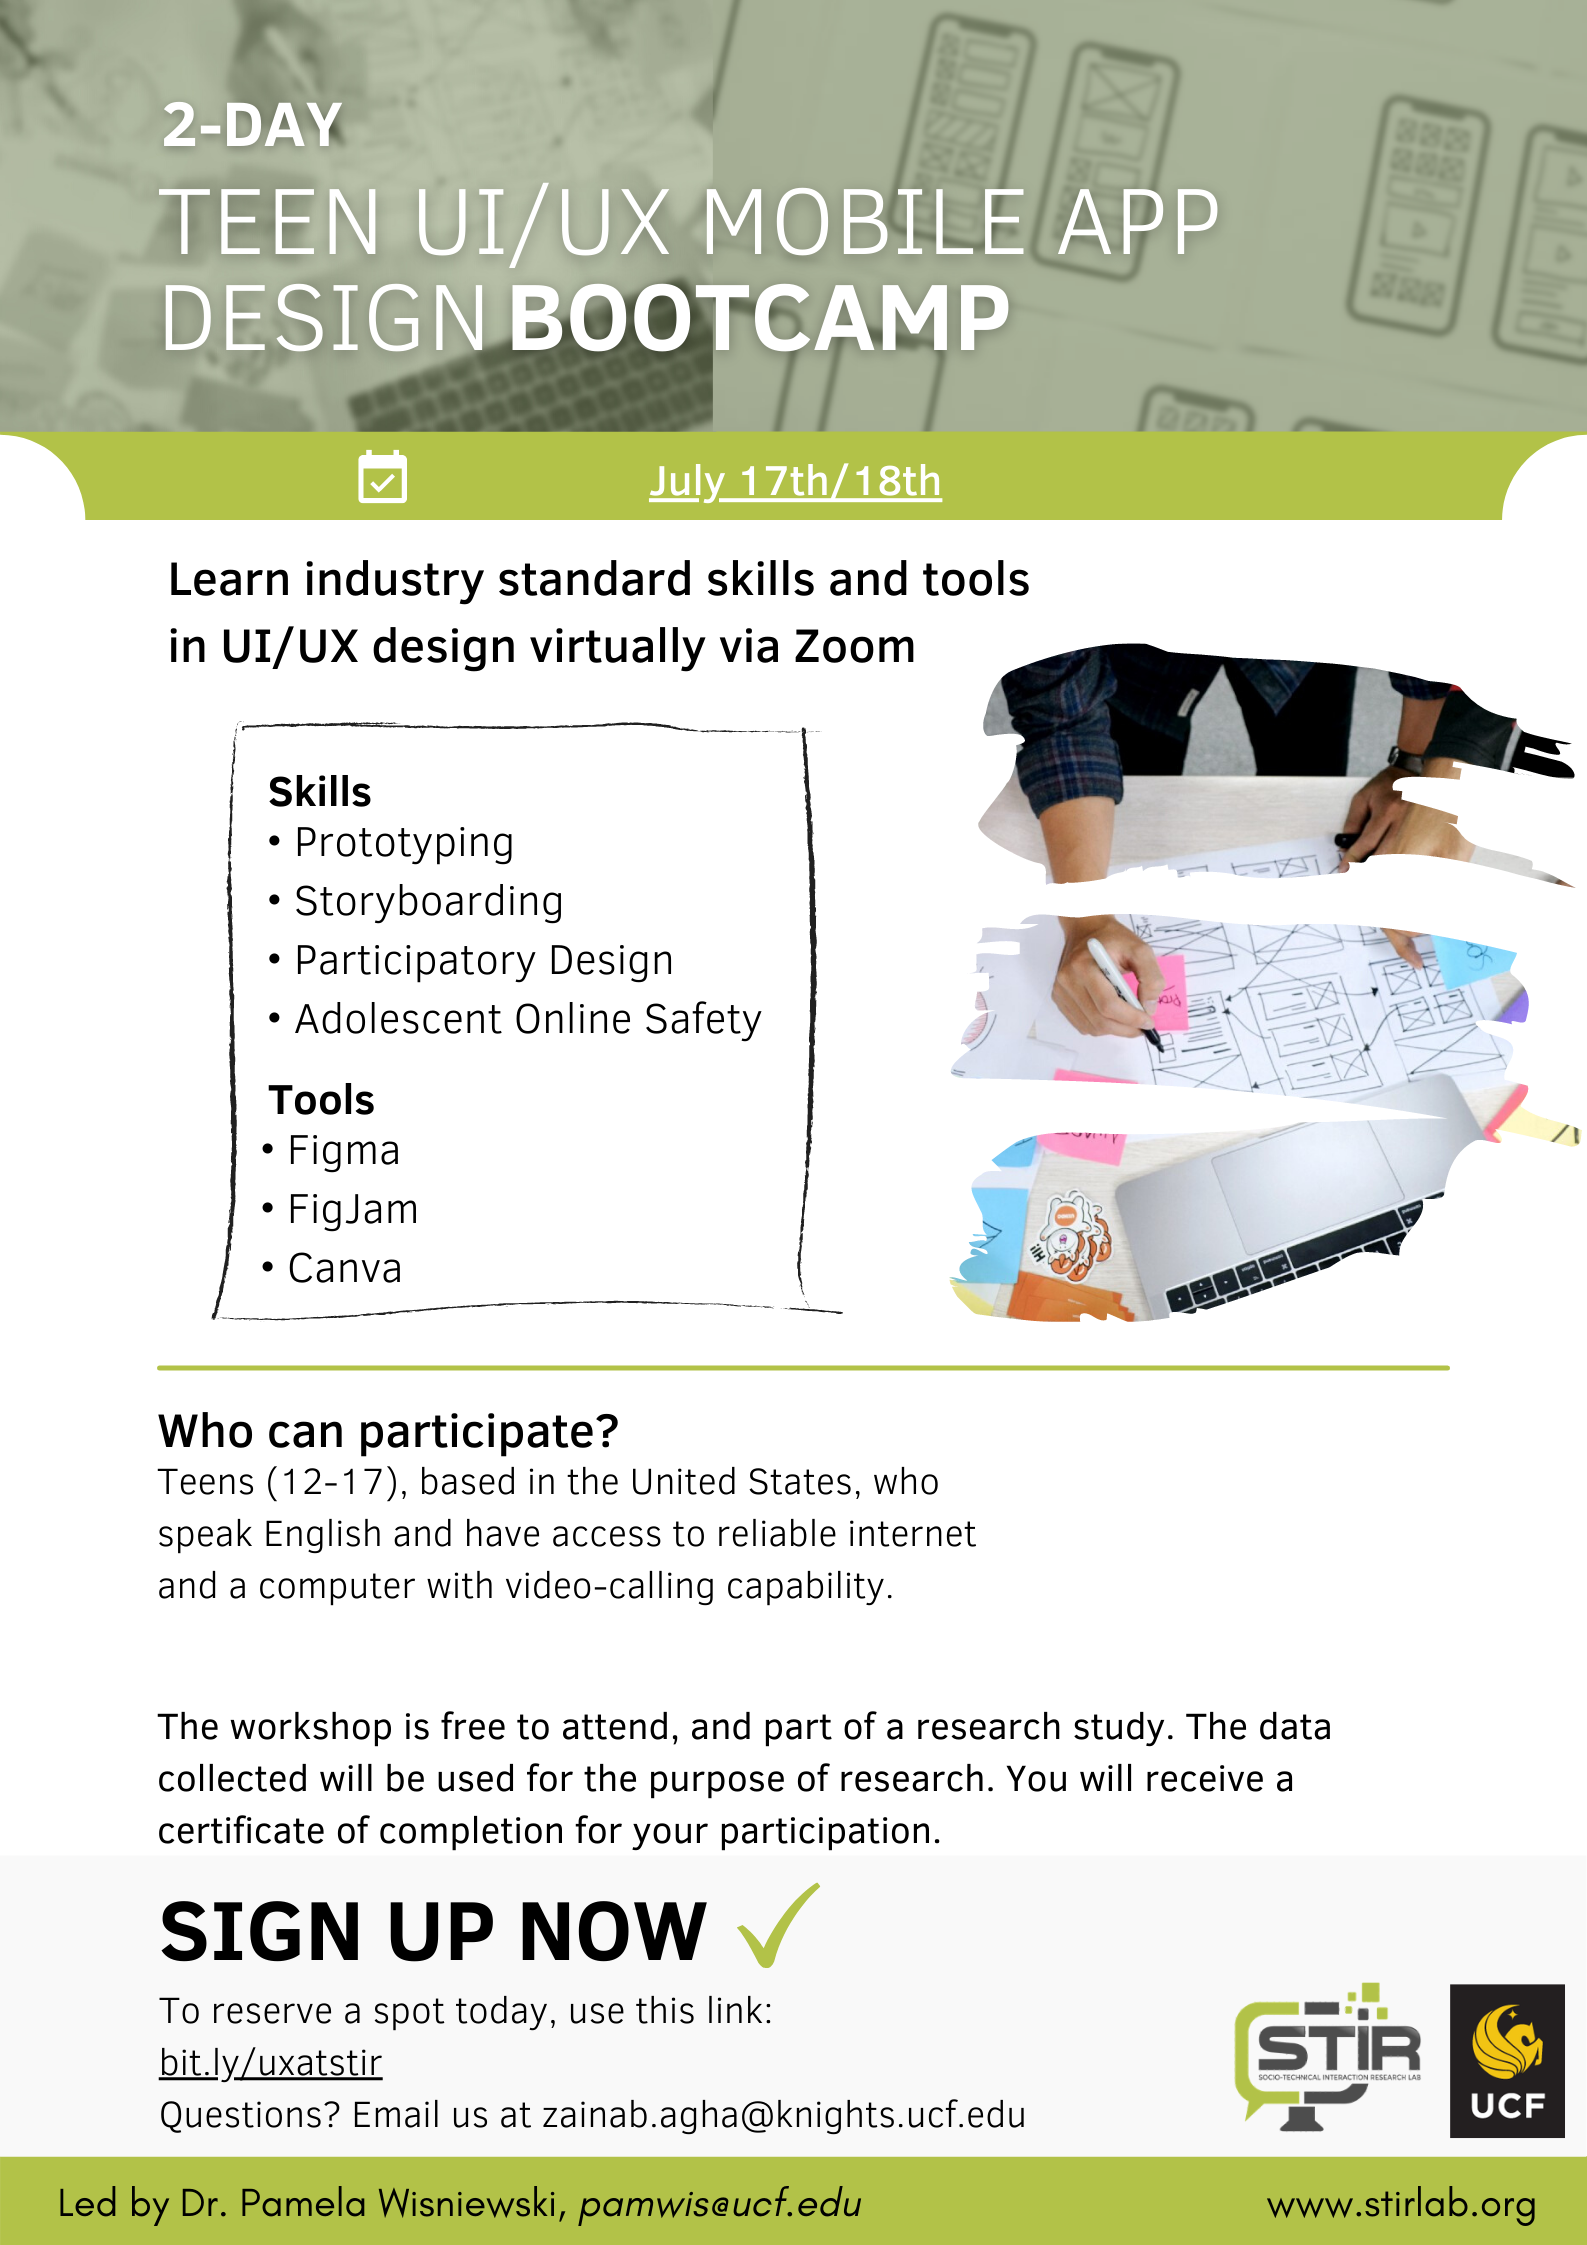 STIR Lab, University of Central Florida: Teen UI/UX Mobile App Design Bootcamp